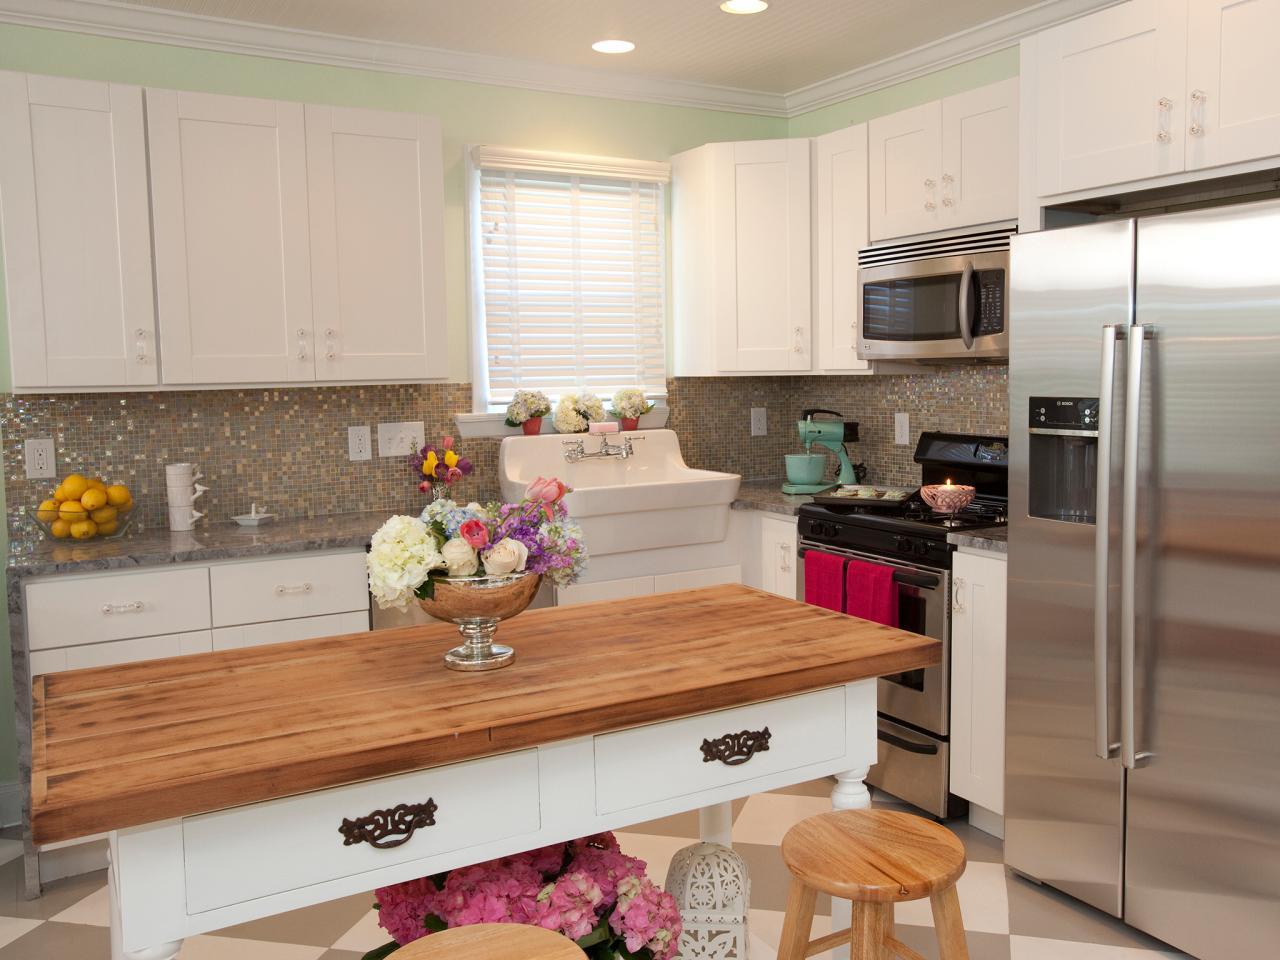 HPBRS408H_country-kitchen-white_4x3.jpg.rend.hgtvcom.1280.960